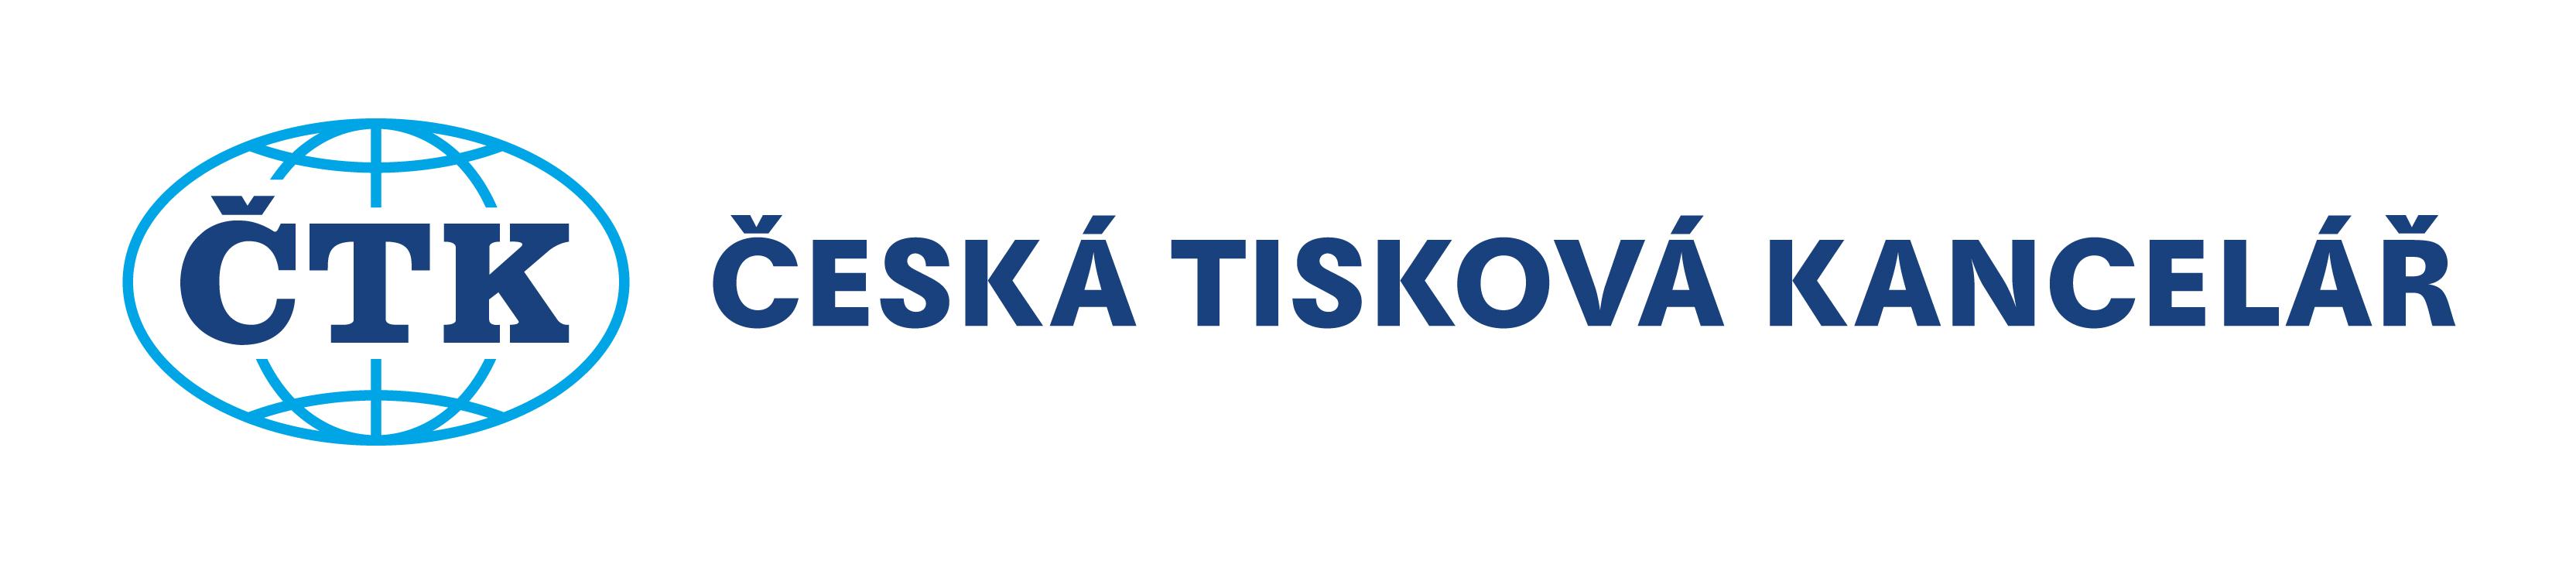 CTK_logo_RGB